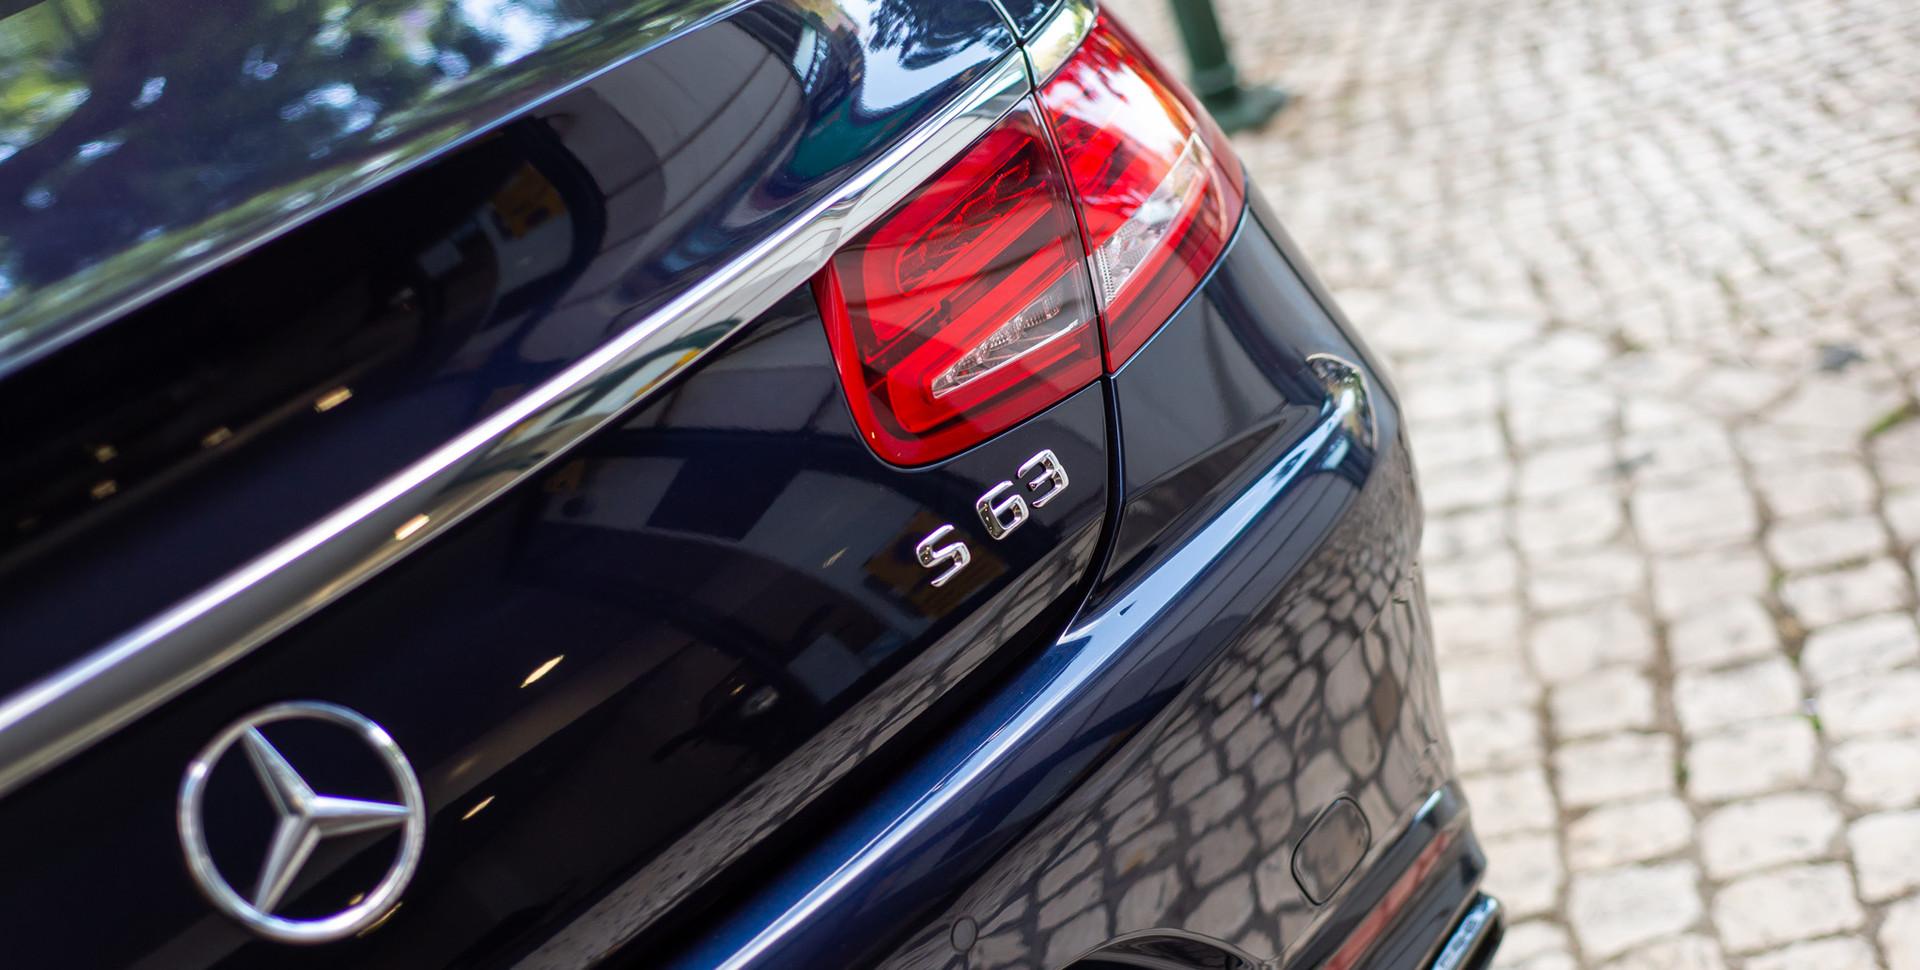 MB S63 AMG Coupe Azul-5.JPG